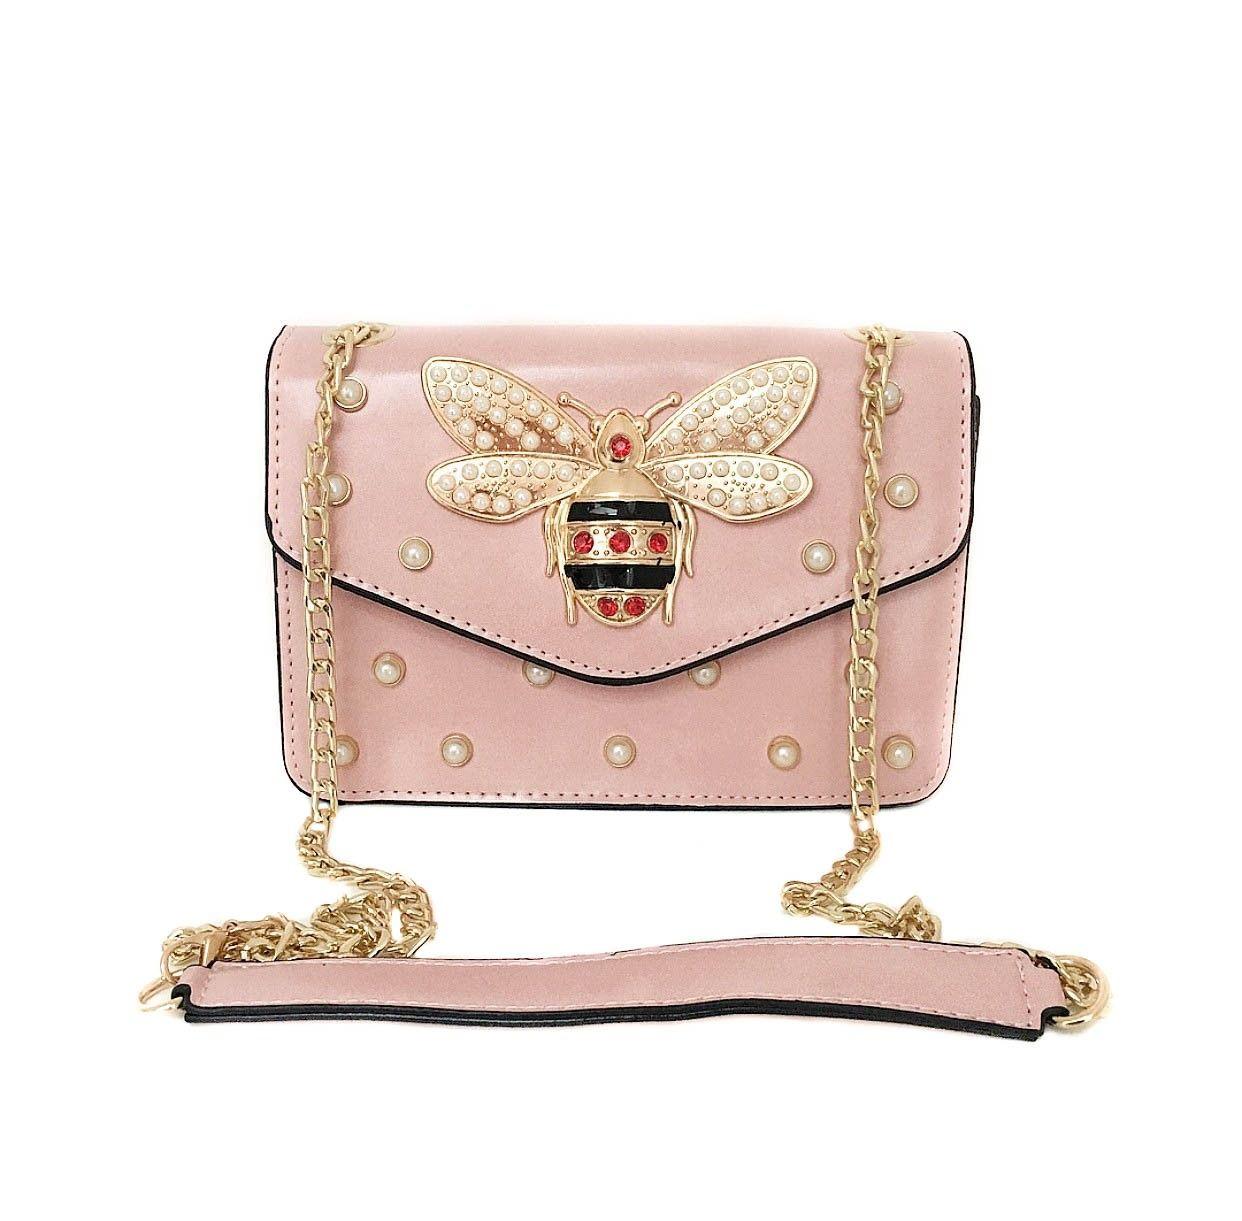 590883b274a Gucci knock-off bee bag